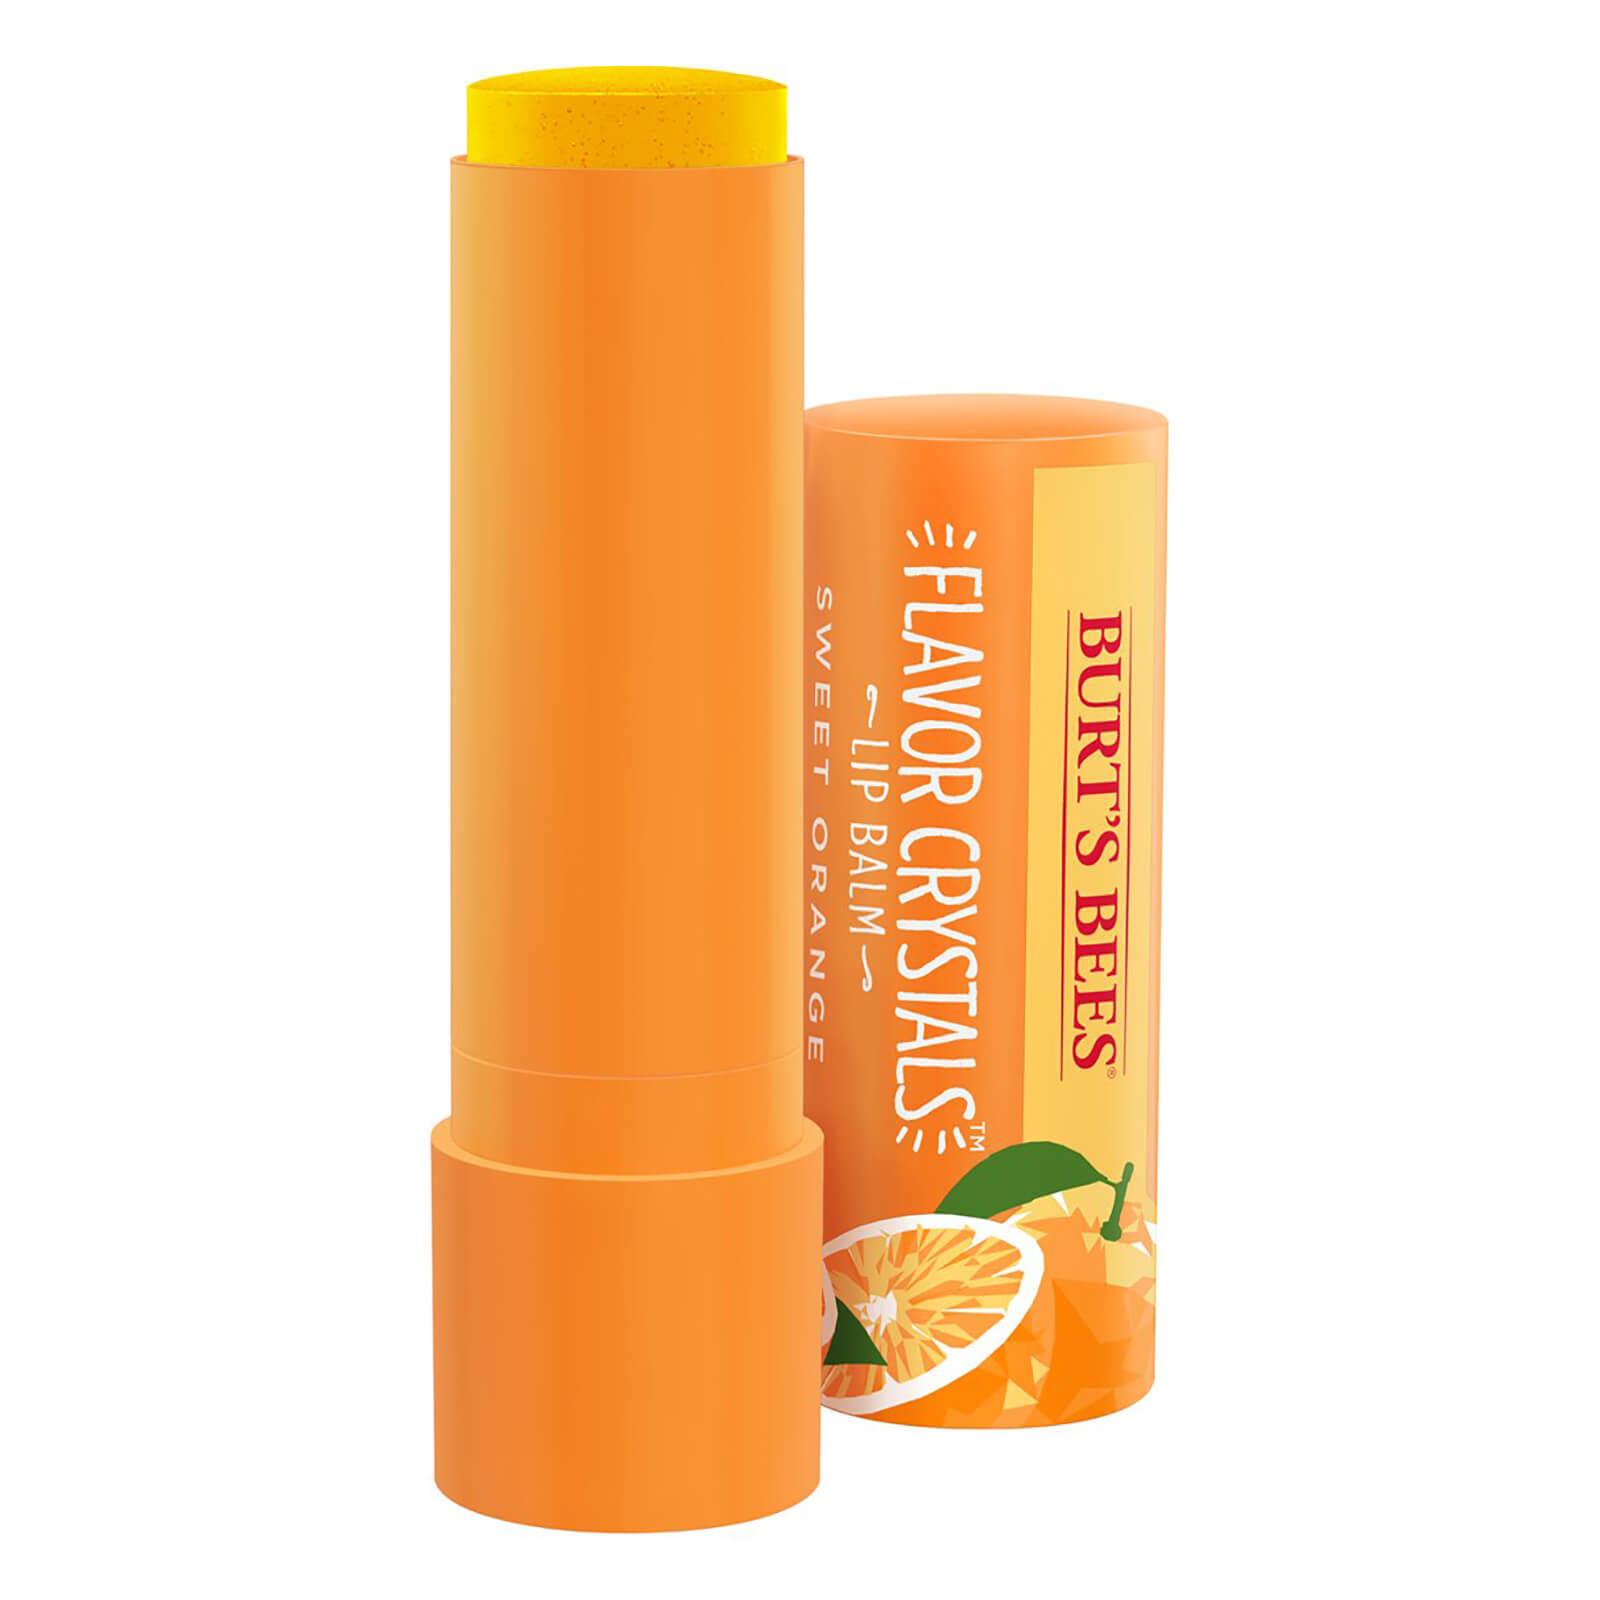 Burts Bees Flavour Crystals 100% Natural Moisturising Lip Balm - Sweet Orange 4.53g